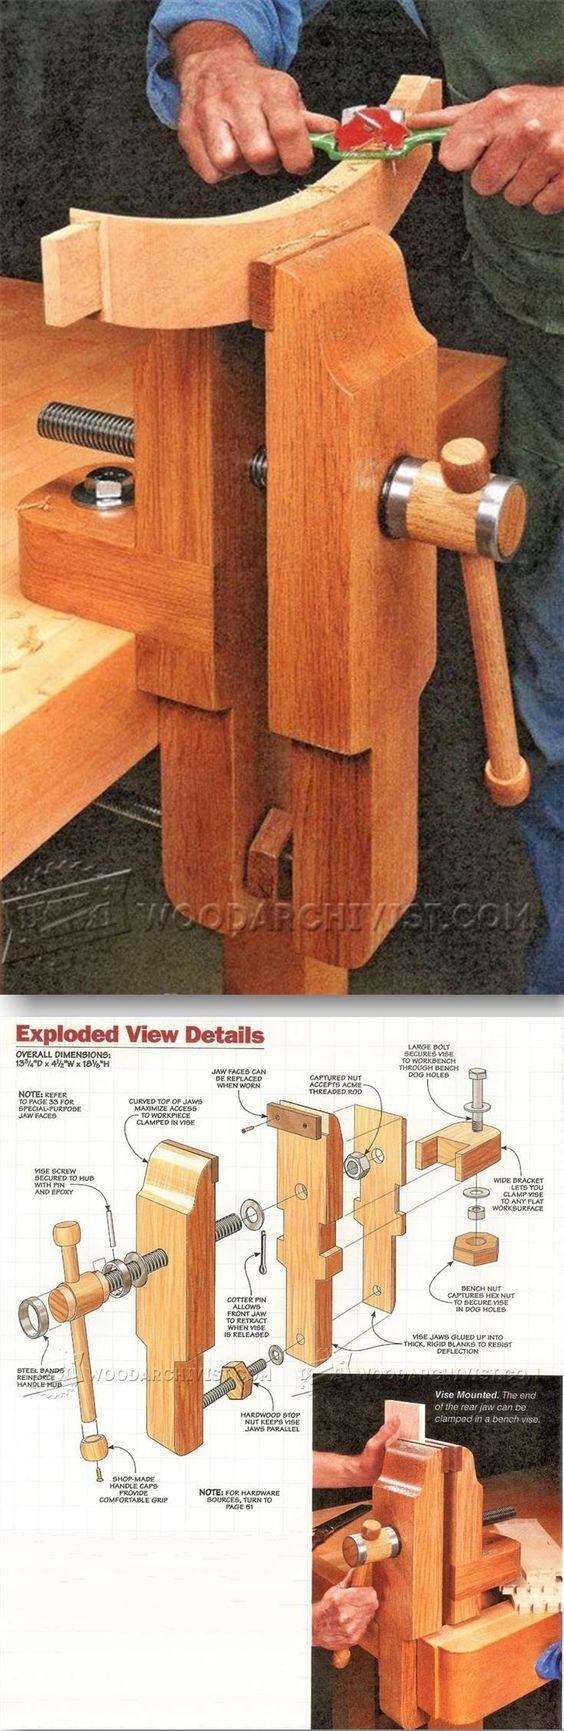 bench vise plans workshop solutions projects tips and tricks amy. Black Bedroom Furniture Sets. Home Design Ideas